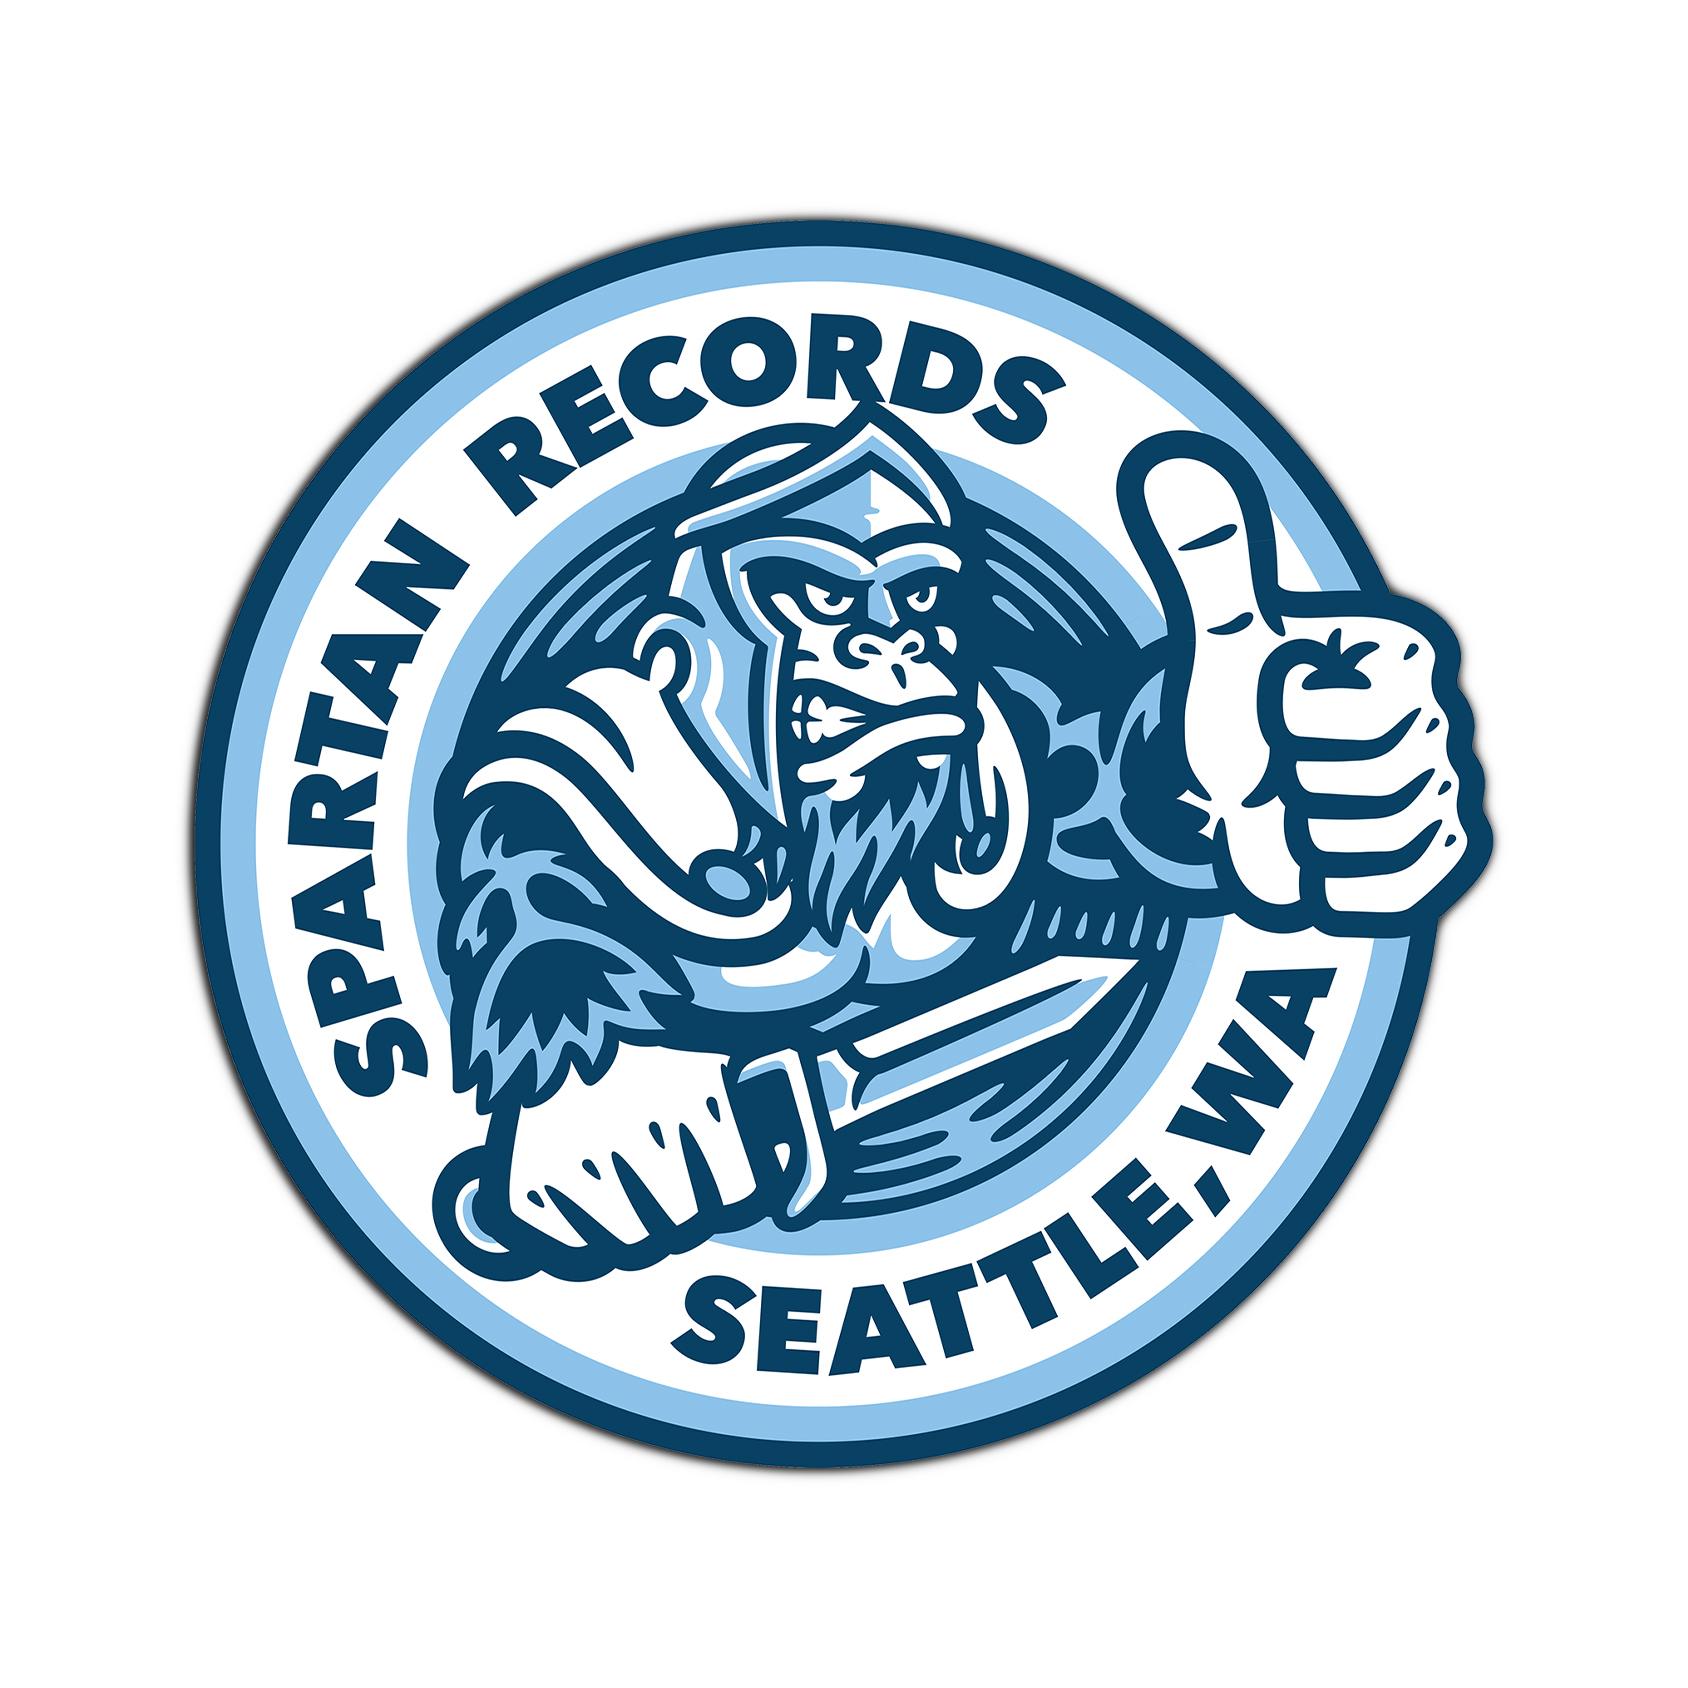 Spartan Thumbs Up 👍 Sticker